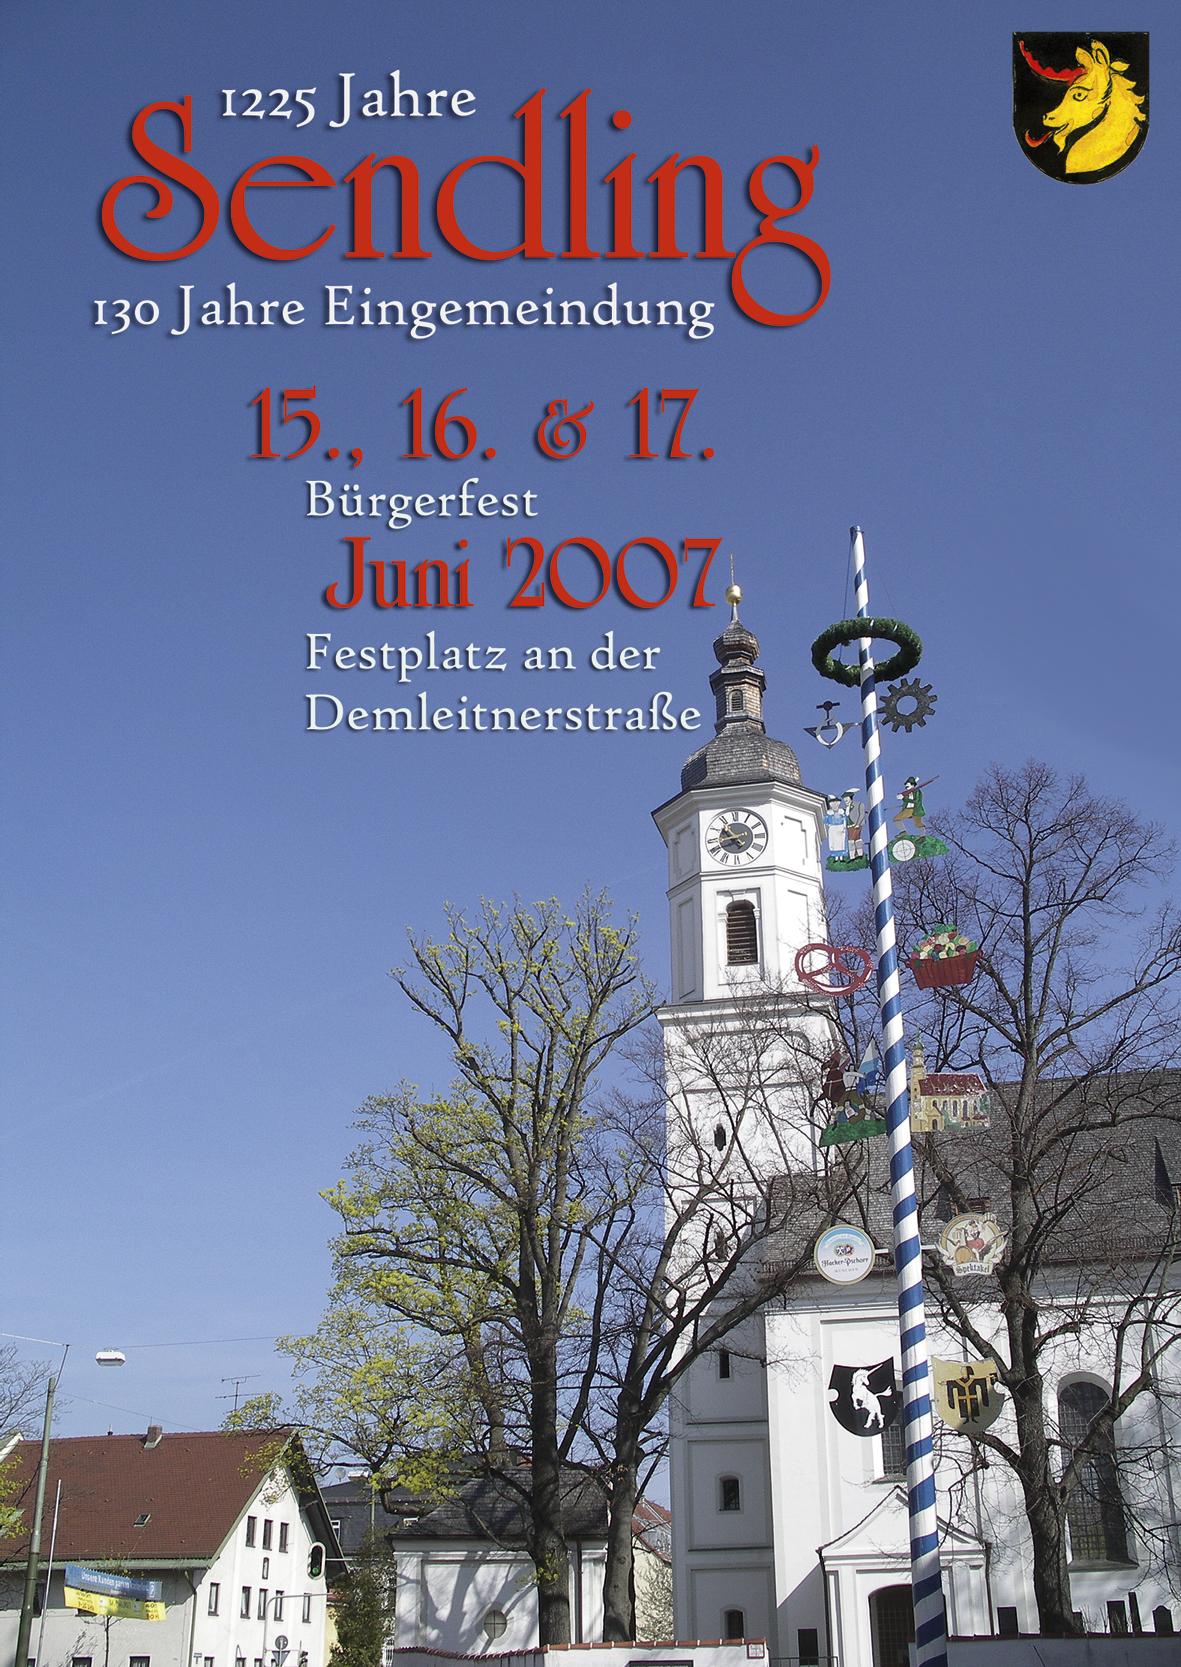 1225_Jahre_Sendling_Plakat.jpg